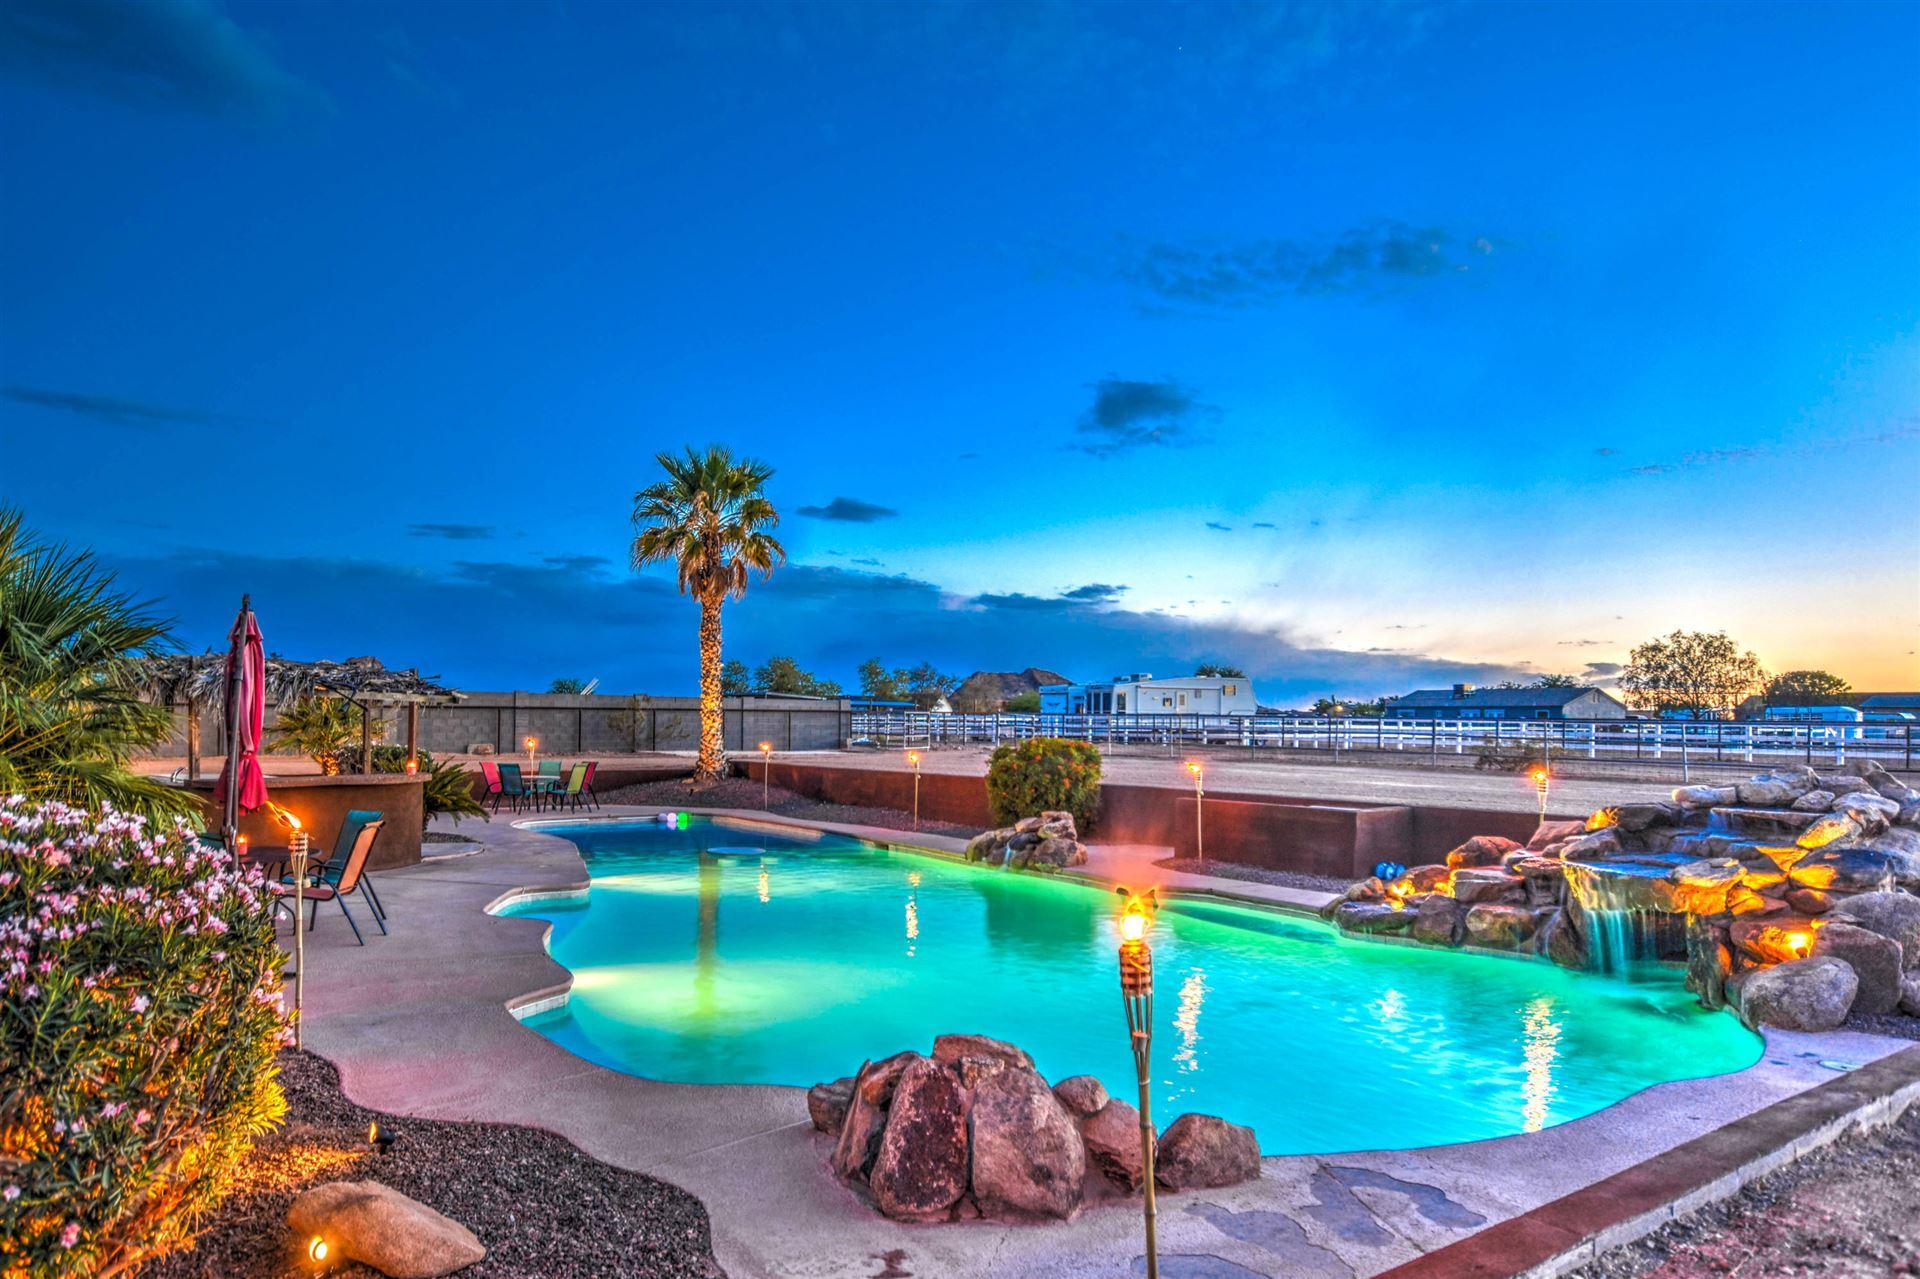 28196 N EDWARDS Road, San Tan Valley, AZ 85143 - MLS#: 6229111